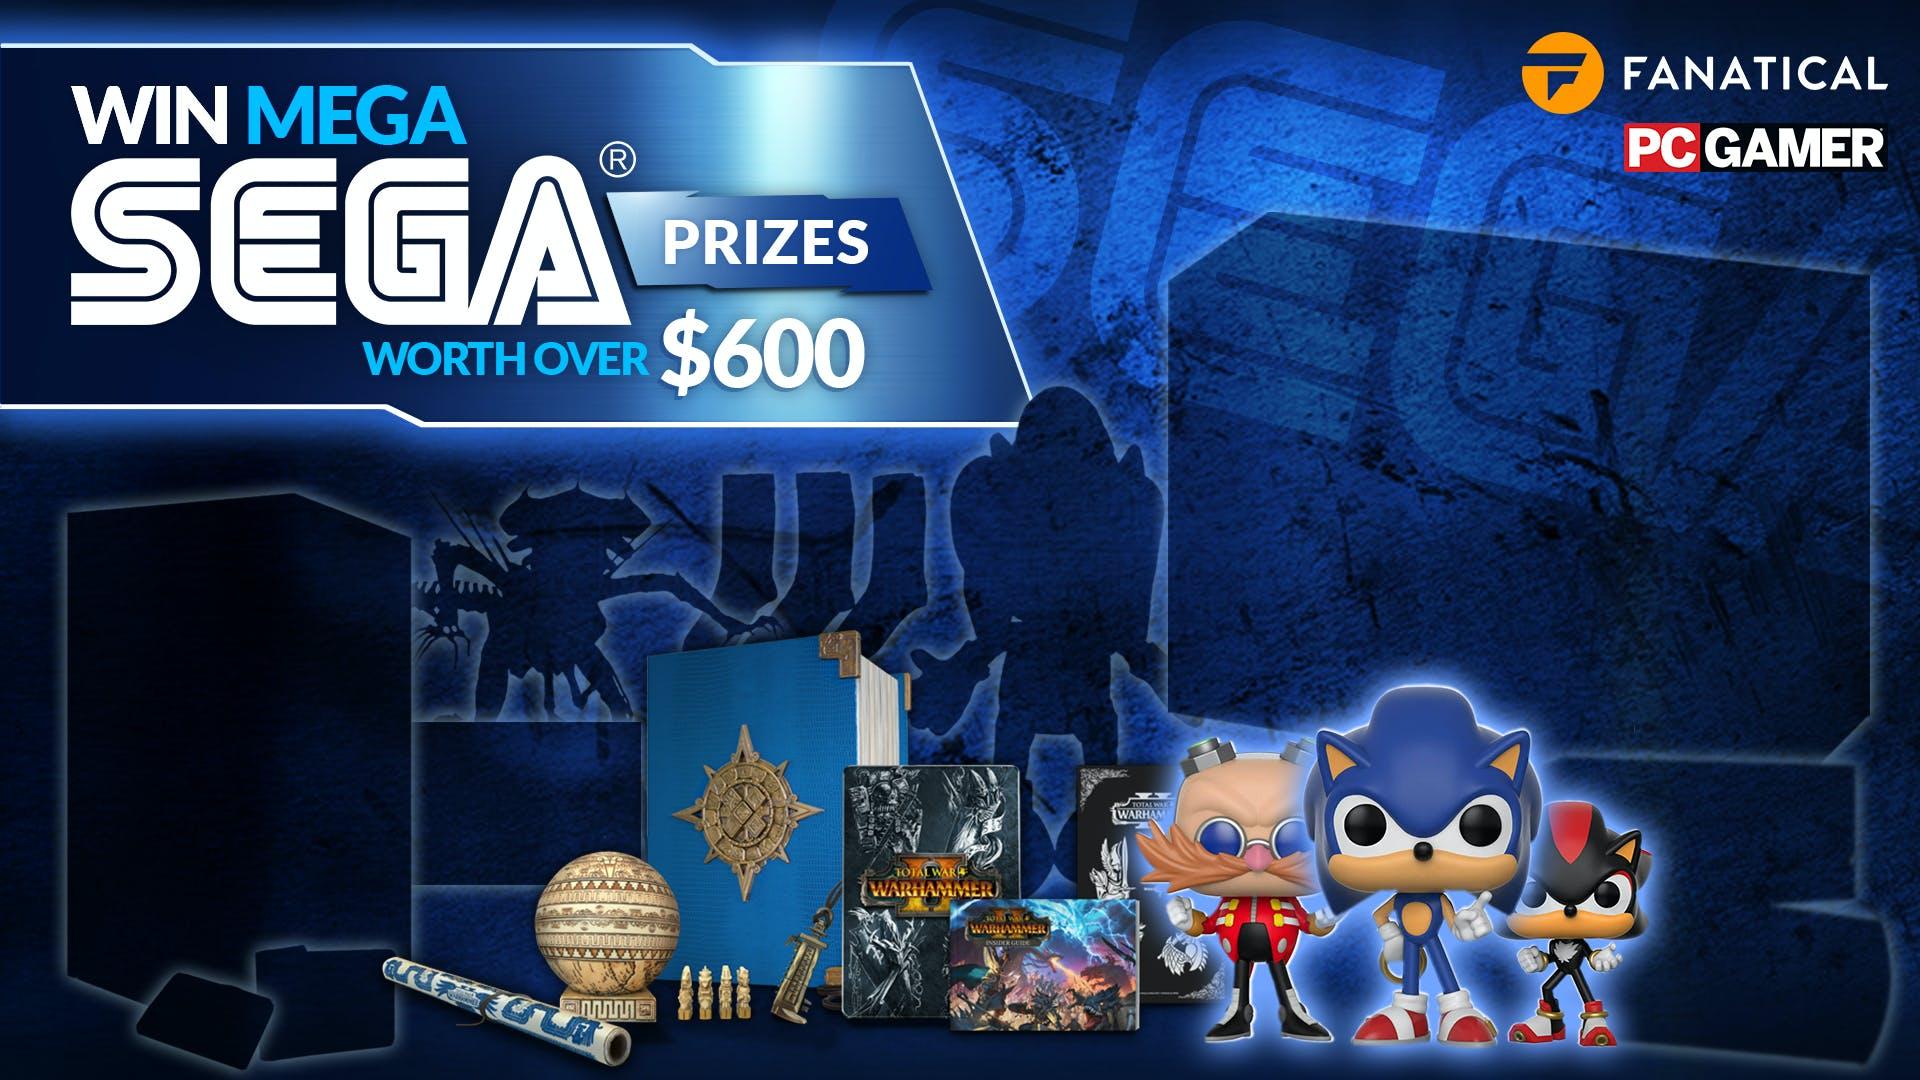 https://images.prismic.io/fanatical/b1a99de758e4061994d3ae5210e4fe286c3585ea_sega-contest-cover-prizes-day02.jpg?auto=compress,format